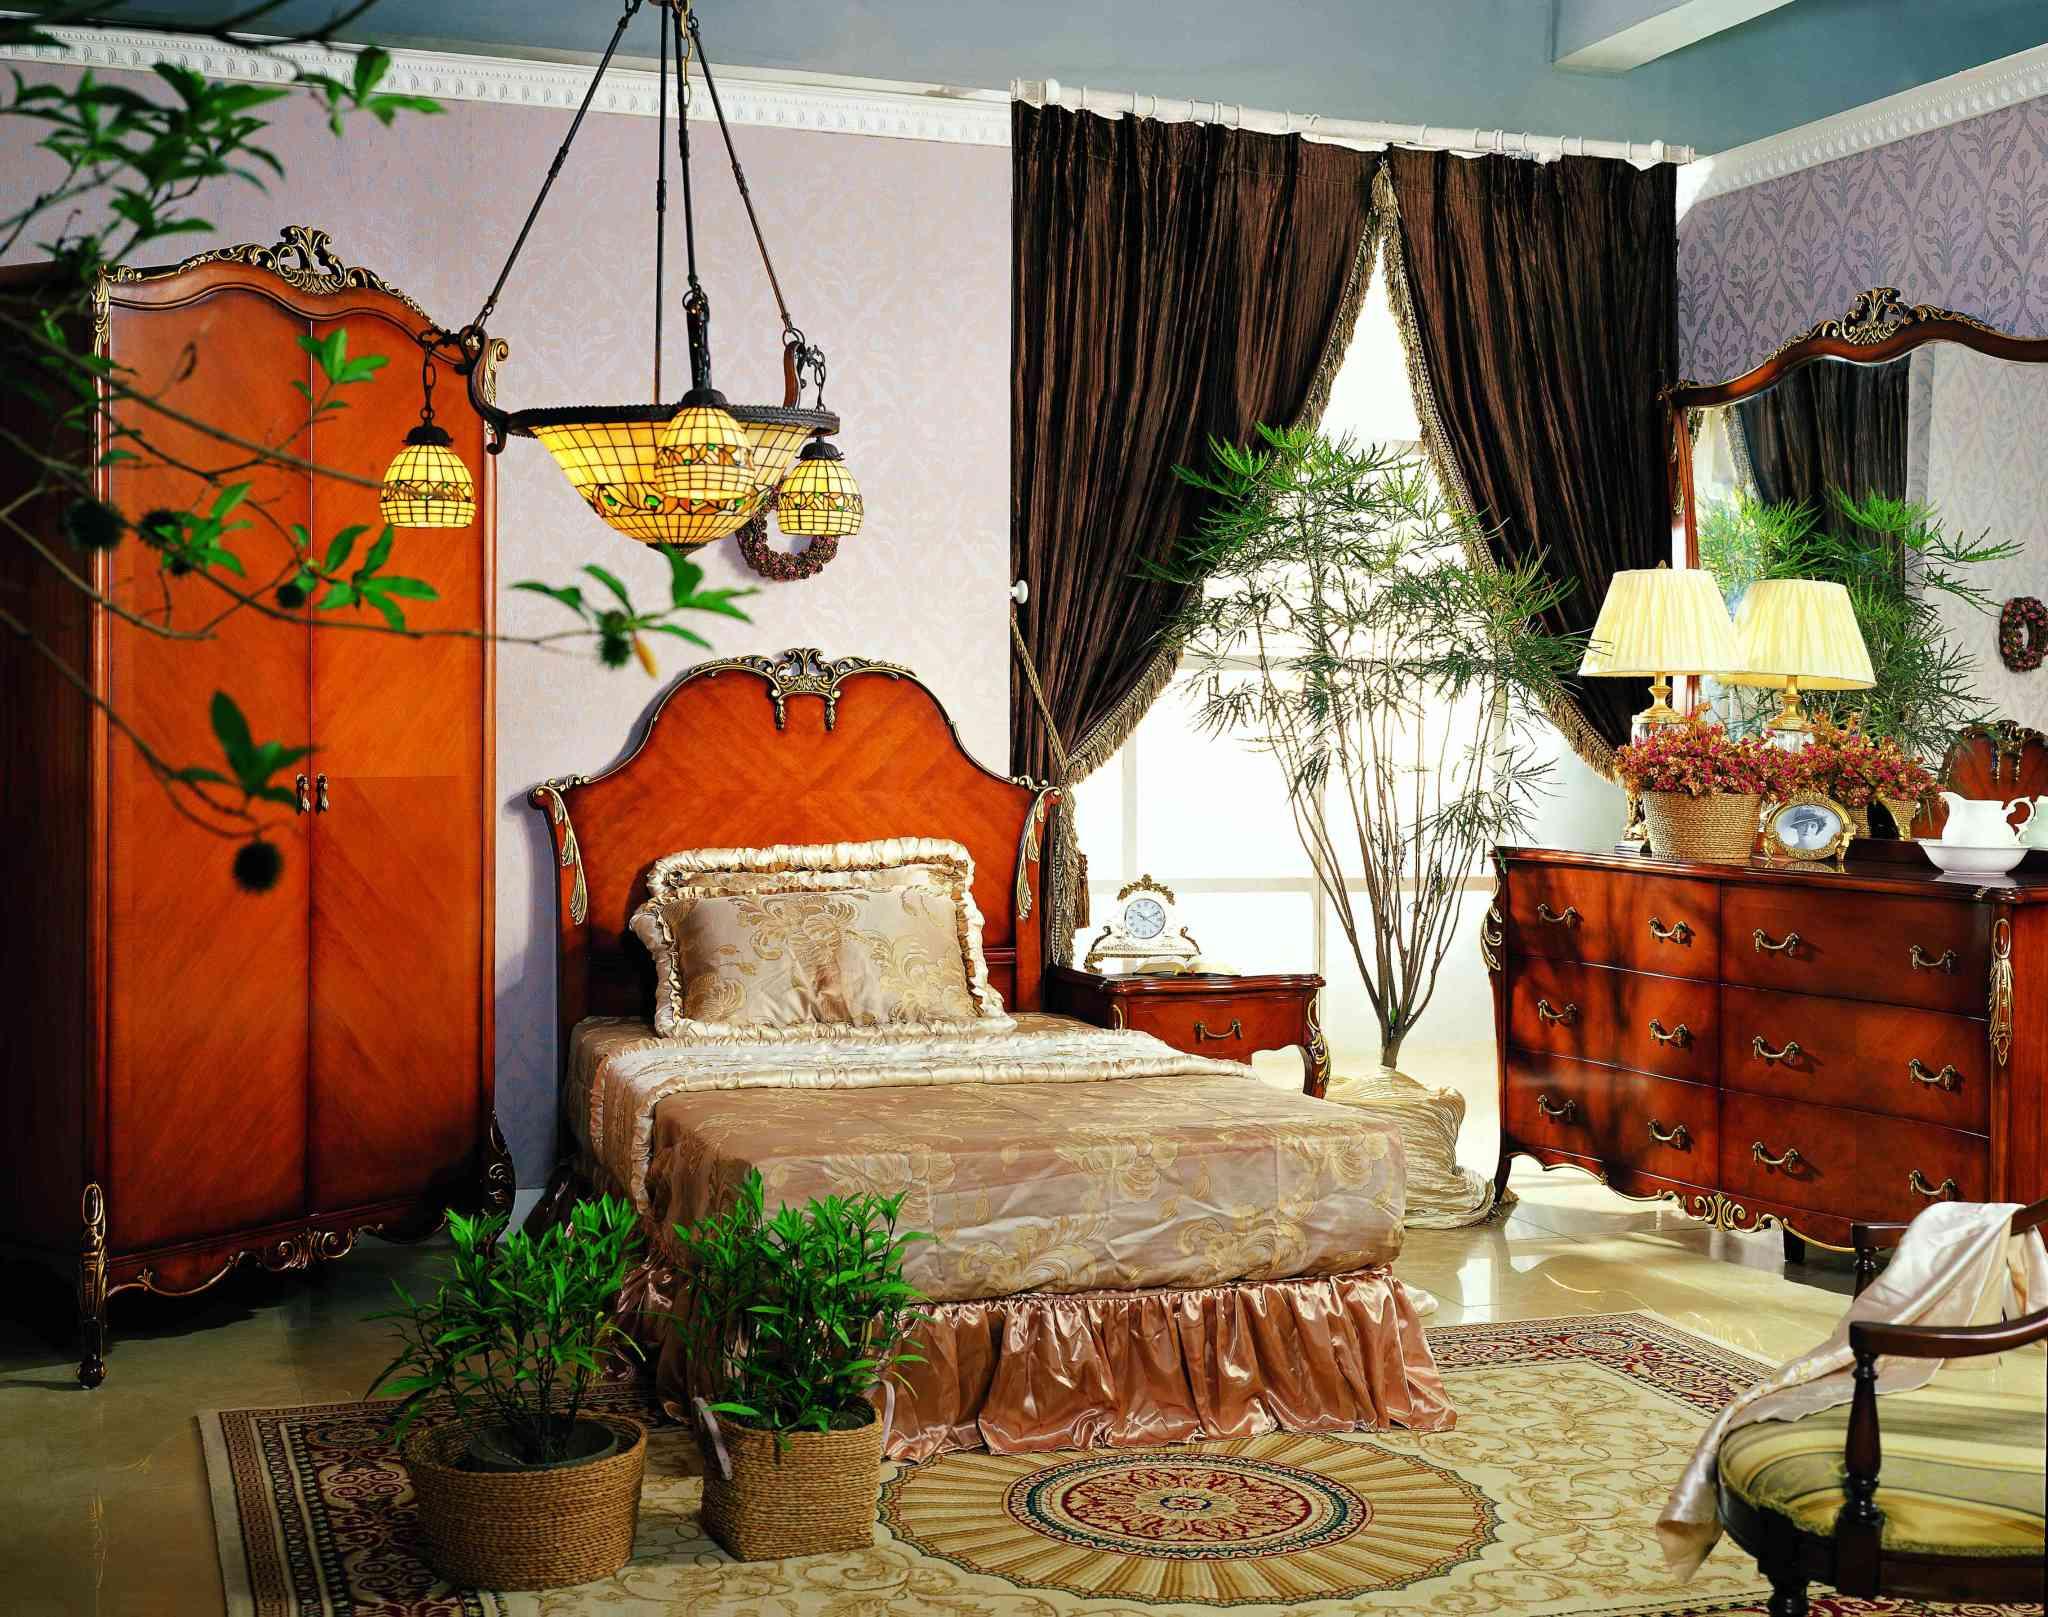 001 plete Bedroom Set Discount Bedroom Sets For Sale Brooklyn New York